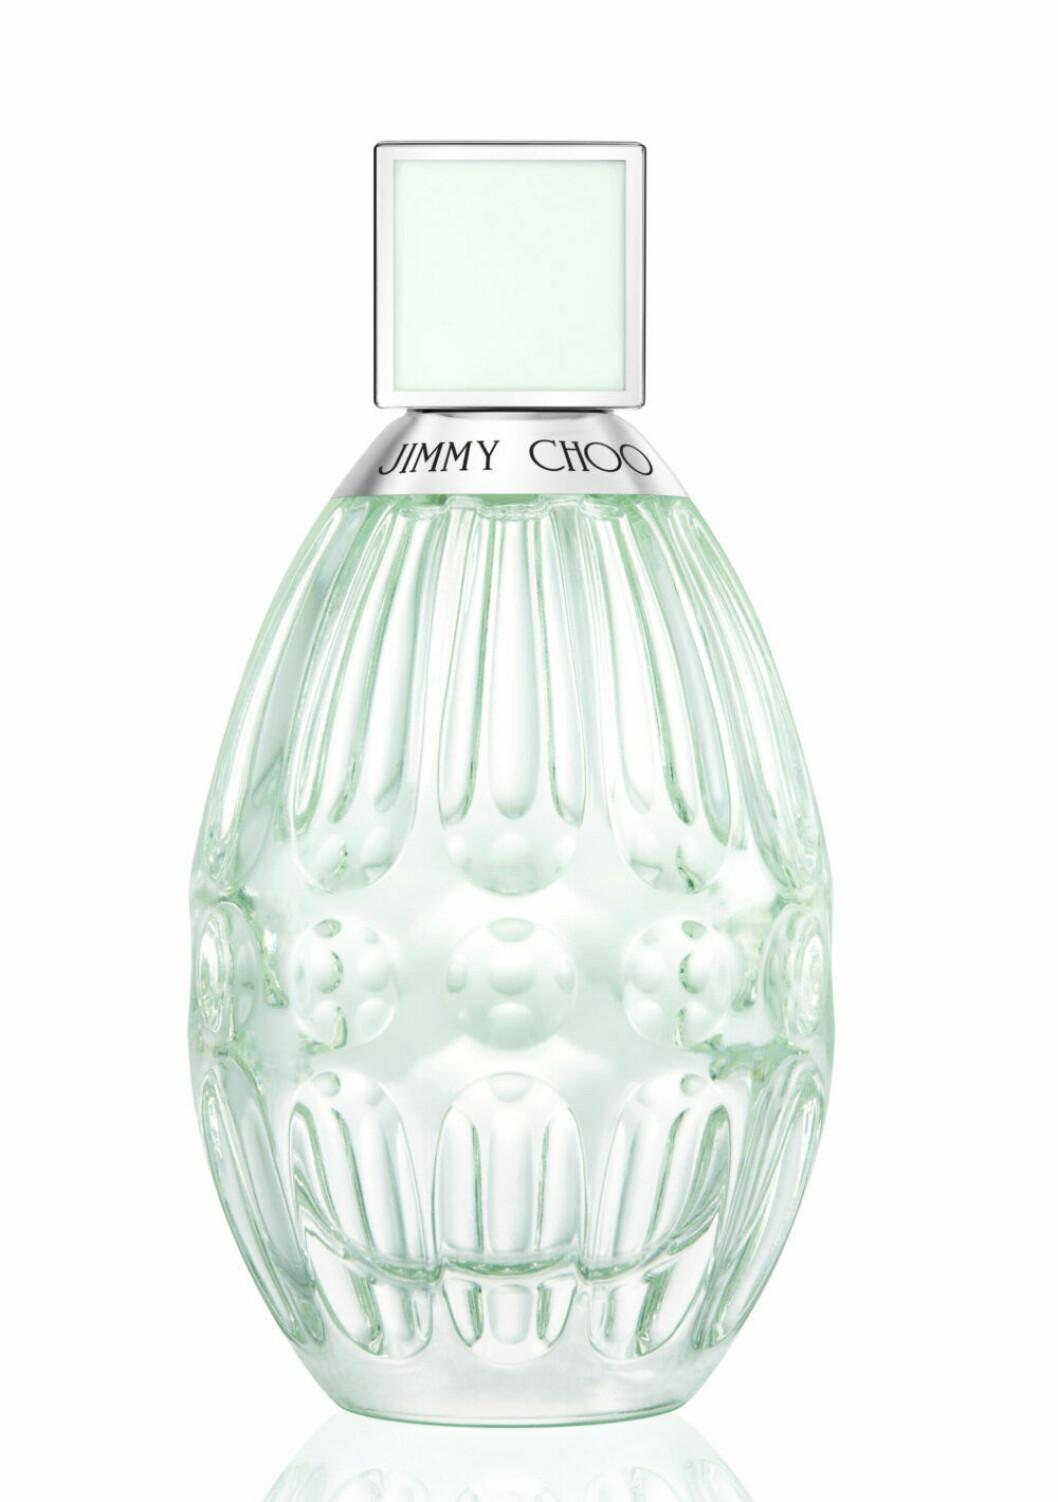 Jimmy Choo parfym